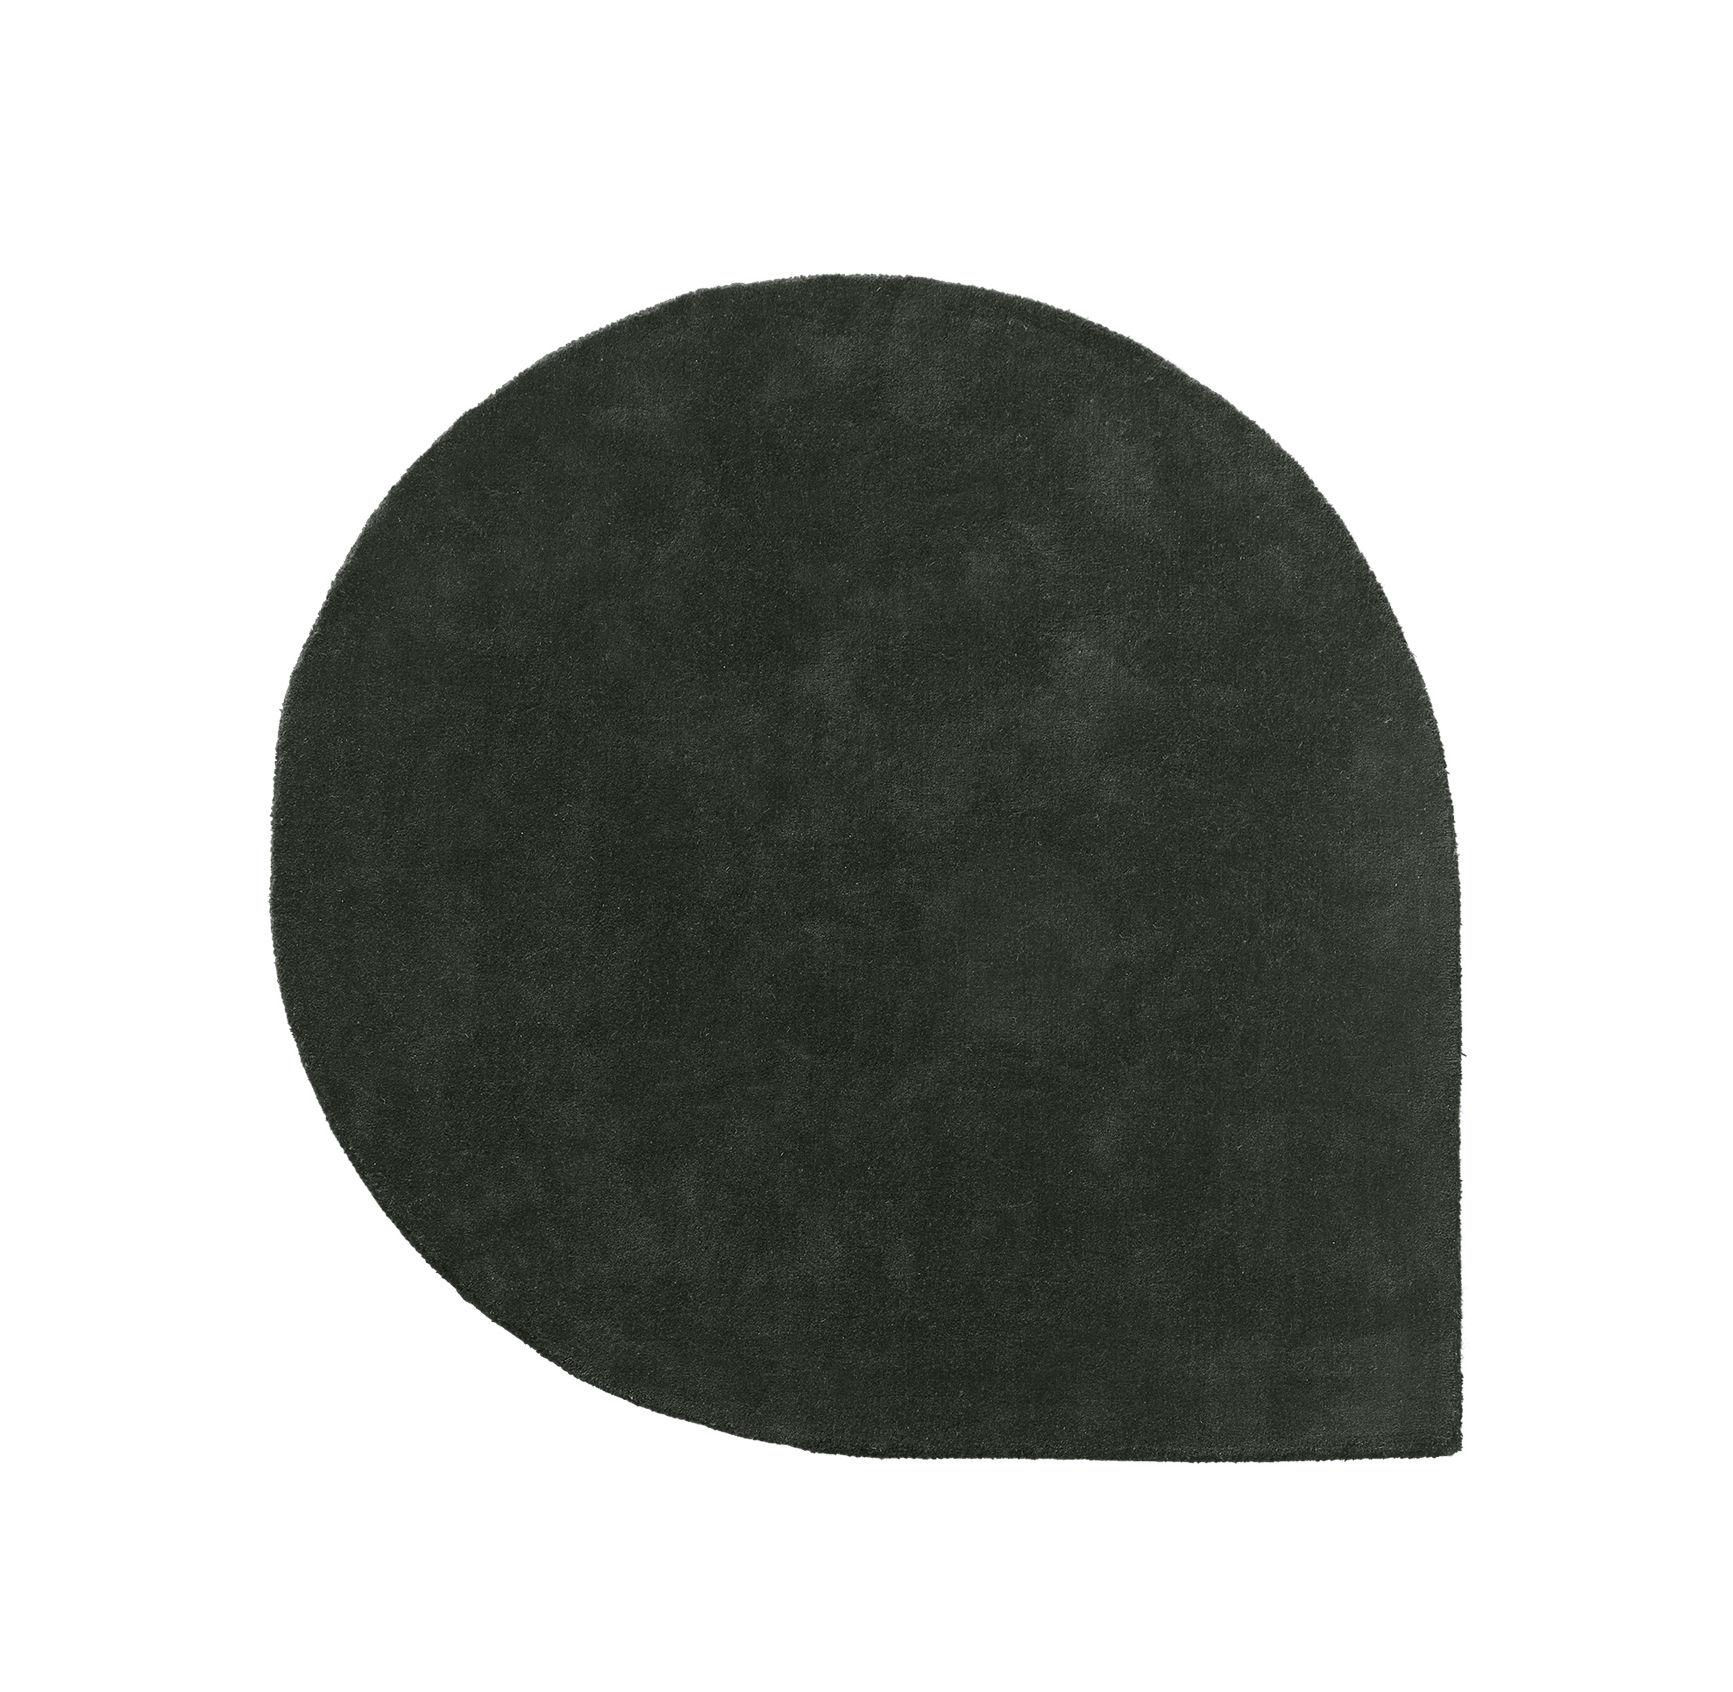 tapis stilla 160 x 130 cm tuft main vert for t aytm. Black Bedroom Furniture Sets. Home Design Ideas